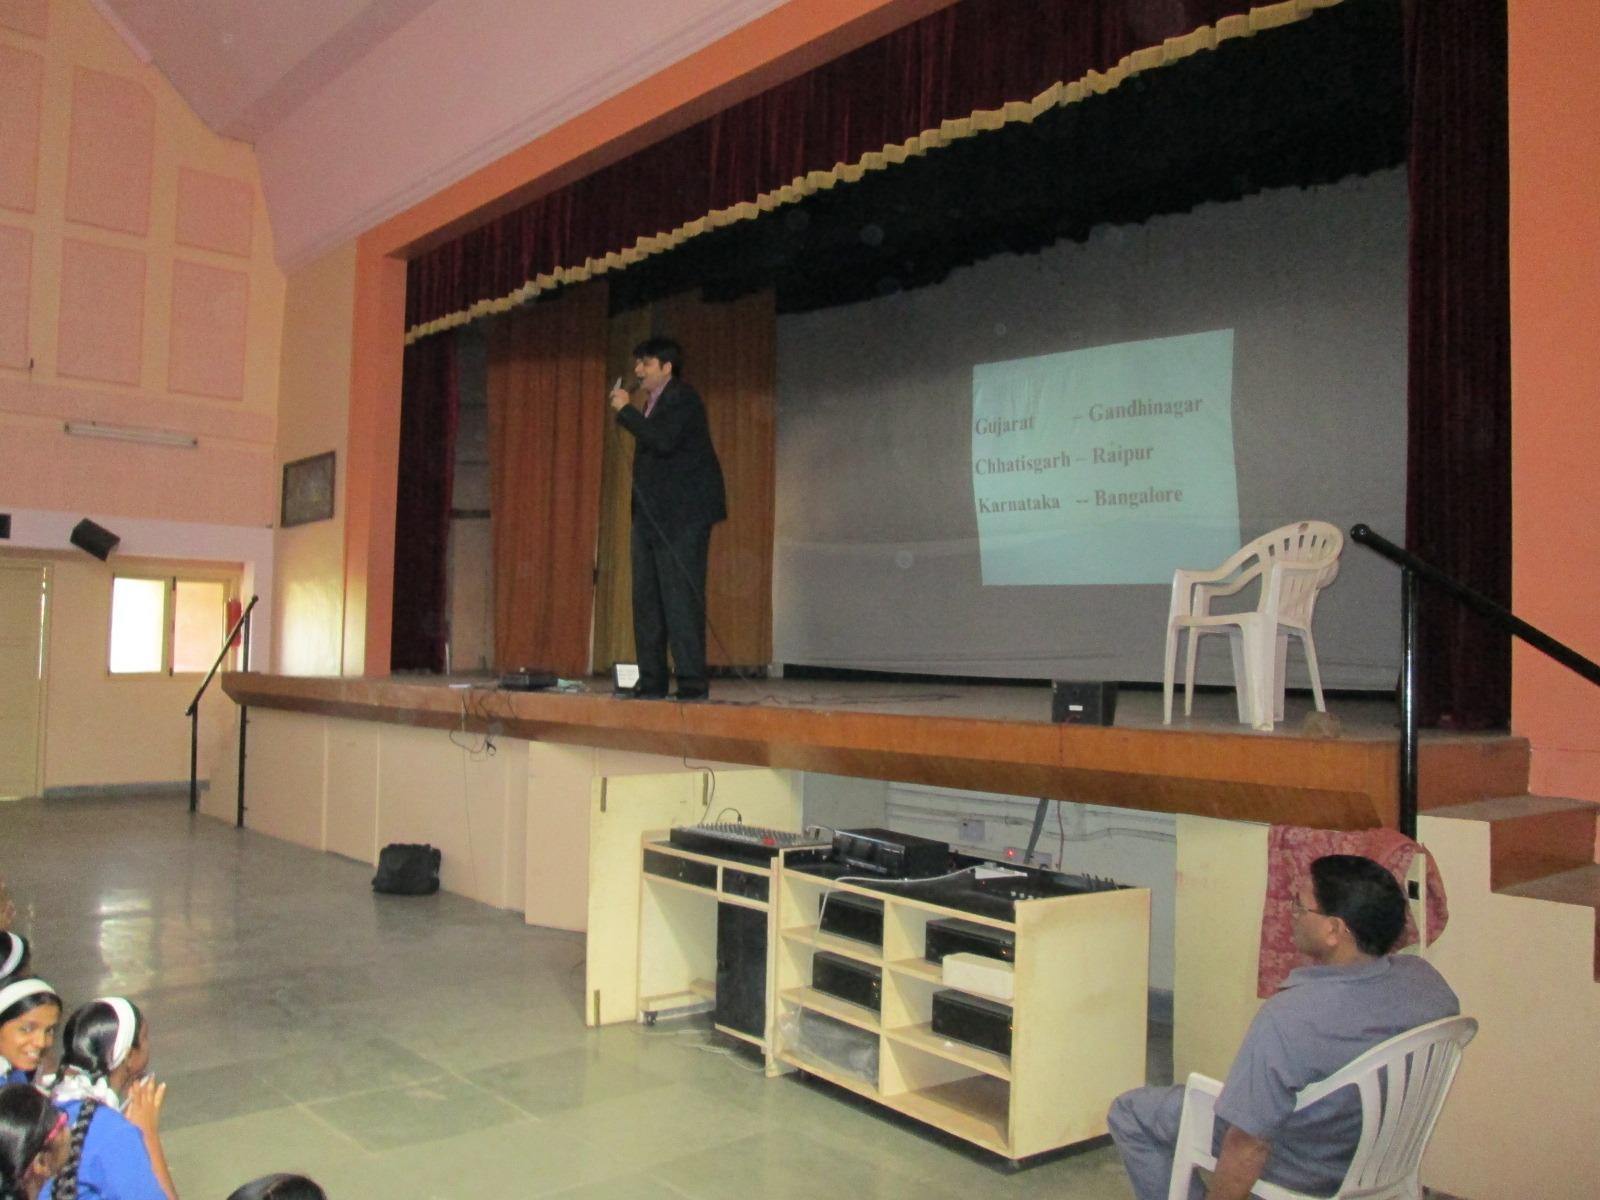 Dhaval Bathia teaching a memory trick